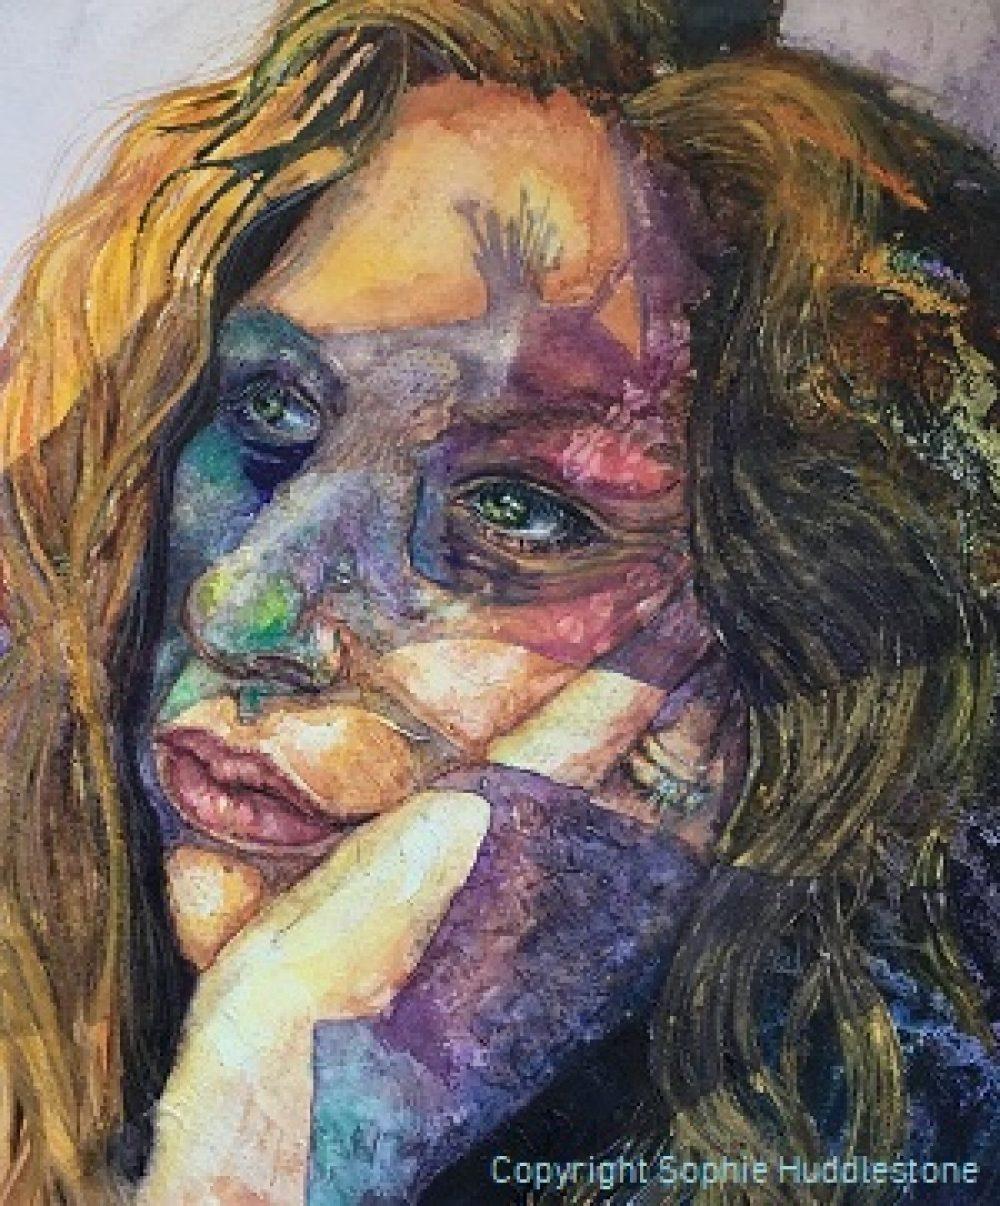 Artist Sophie Huddlestone self portrait